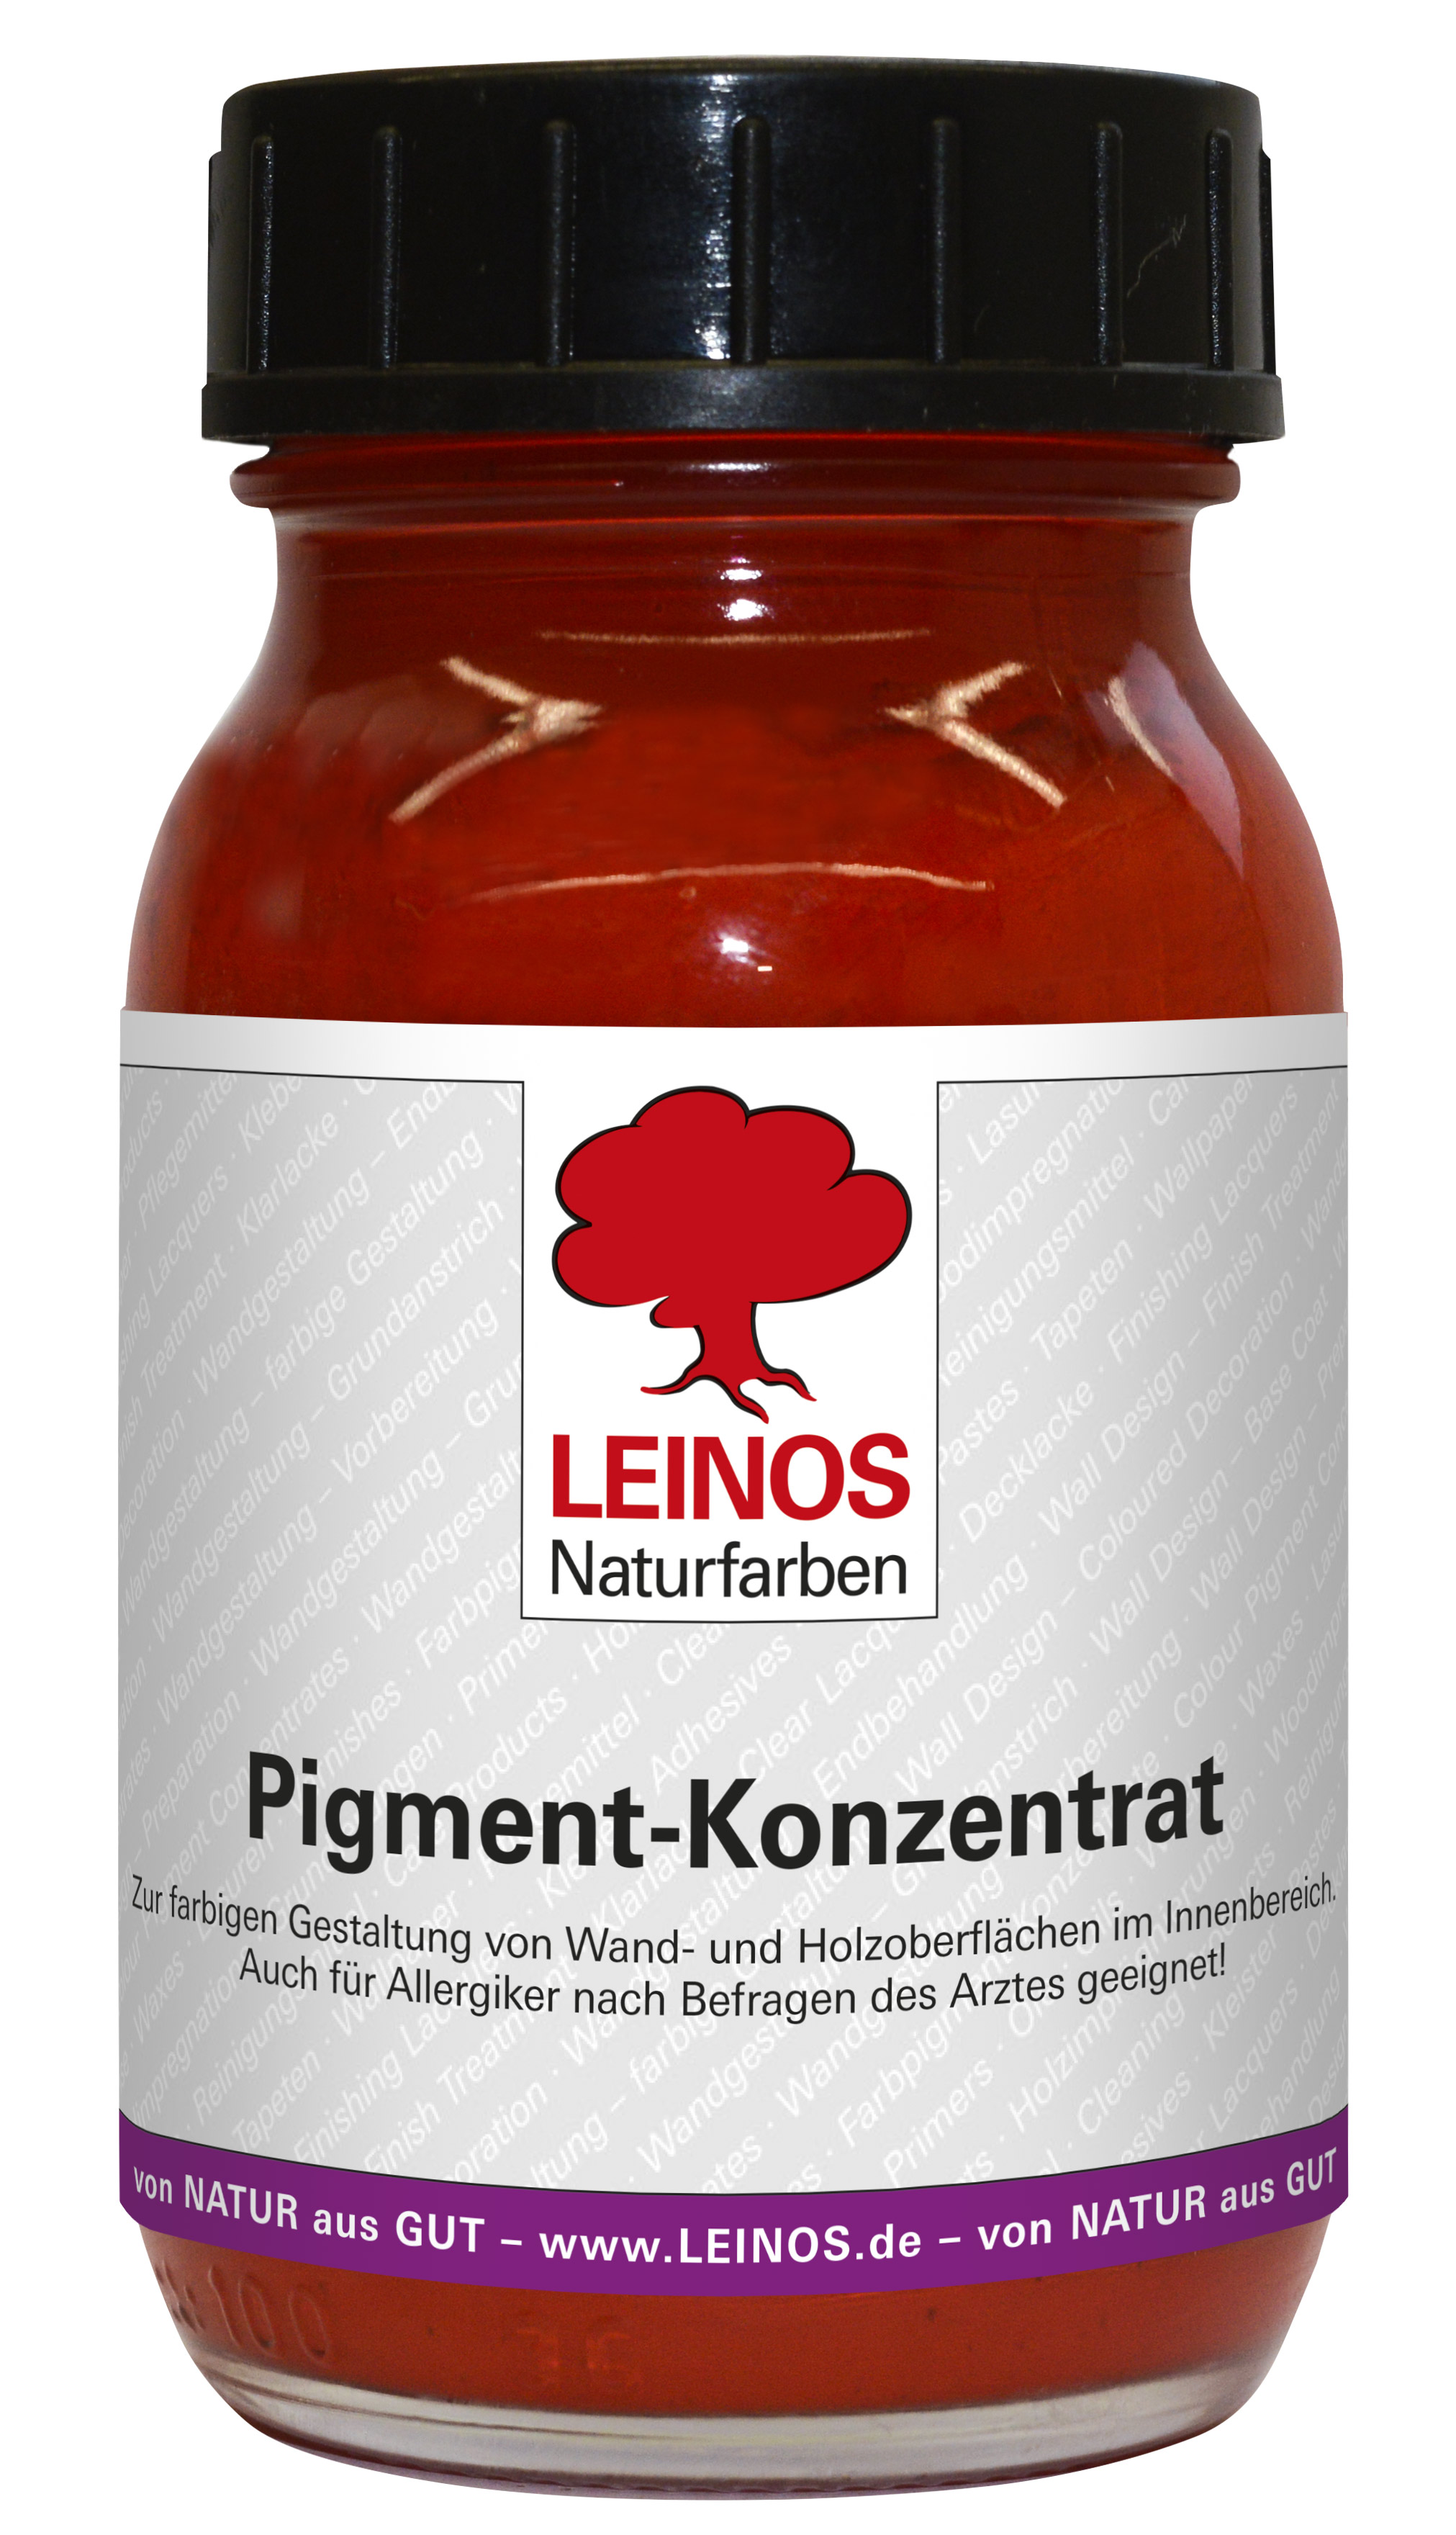 Leinos Pigment-Konzentrat